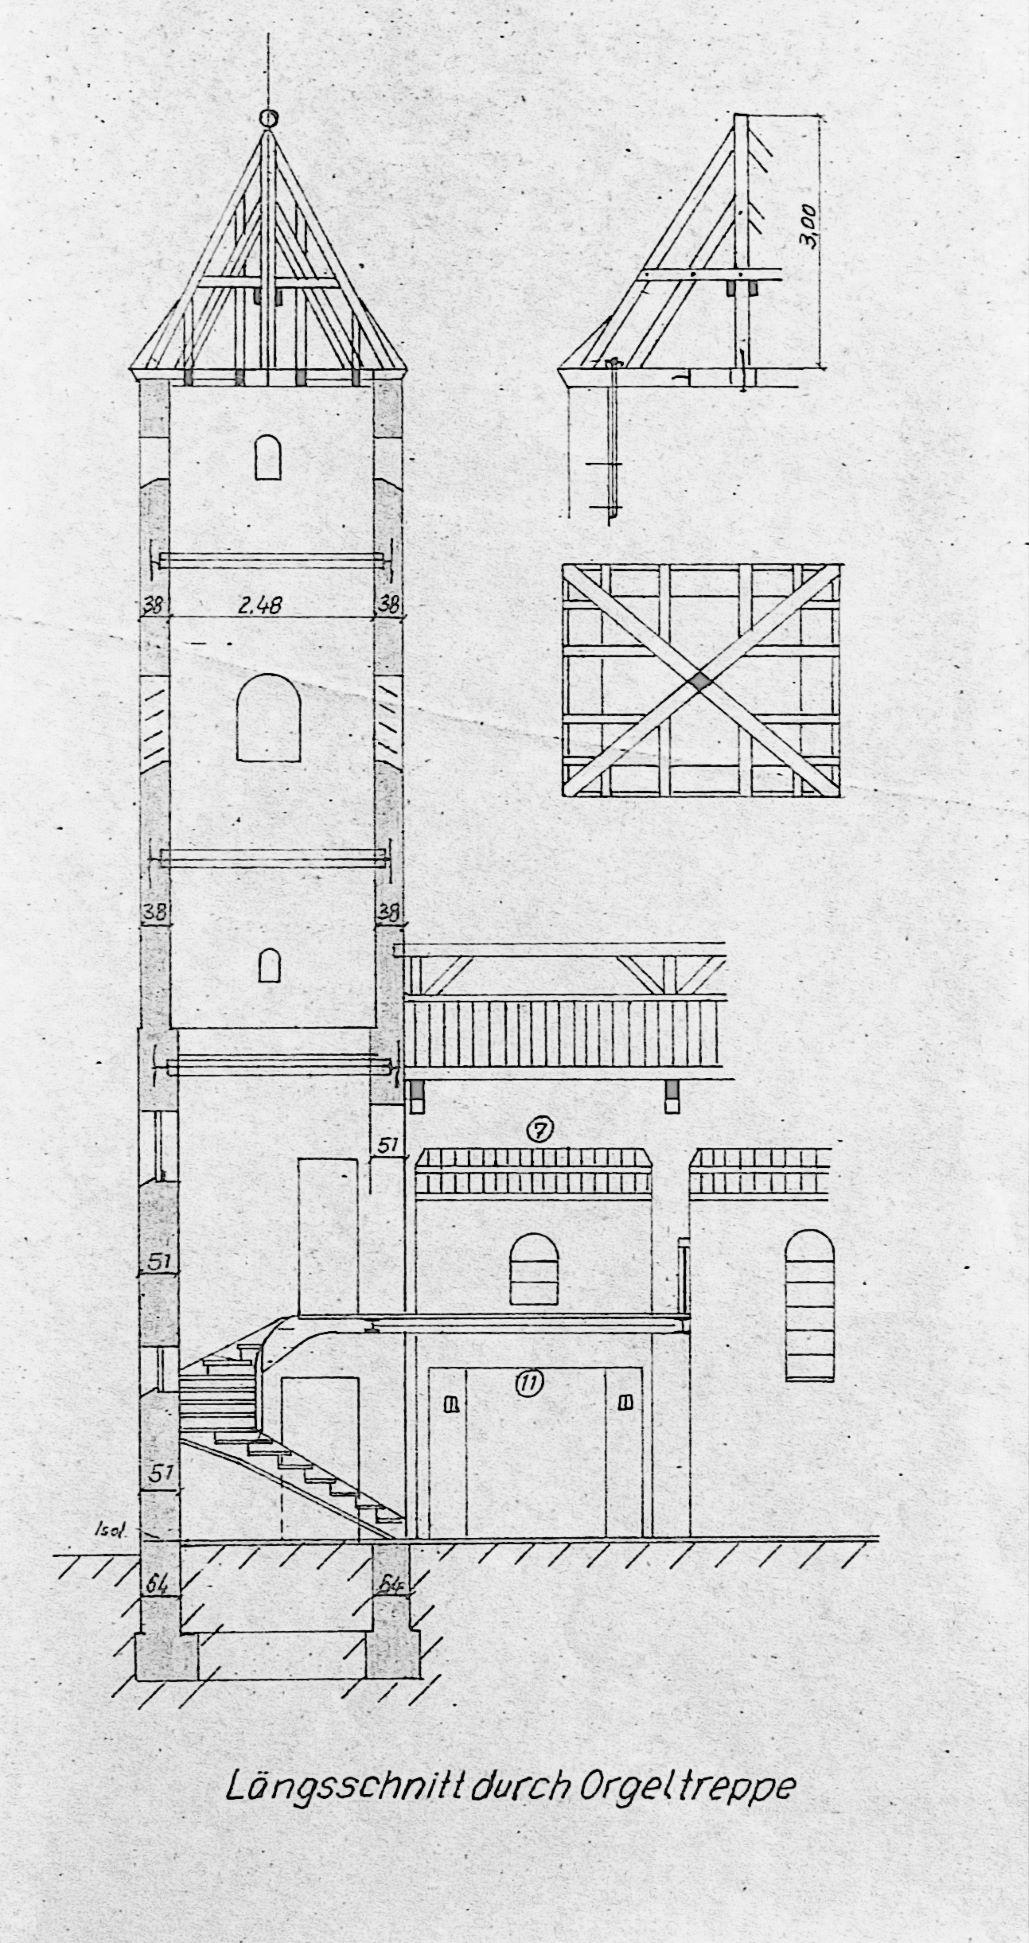 Ausschnitt aus dem Entwurf Kühns; Quelle: Pfarrarchiv St. Elisabeth